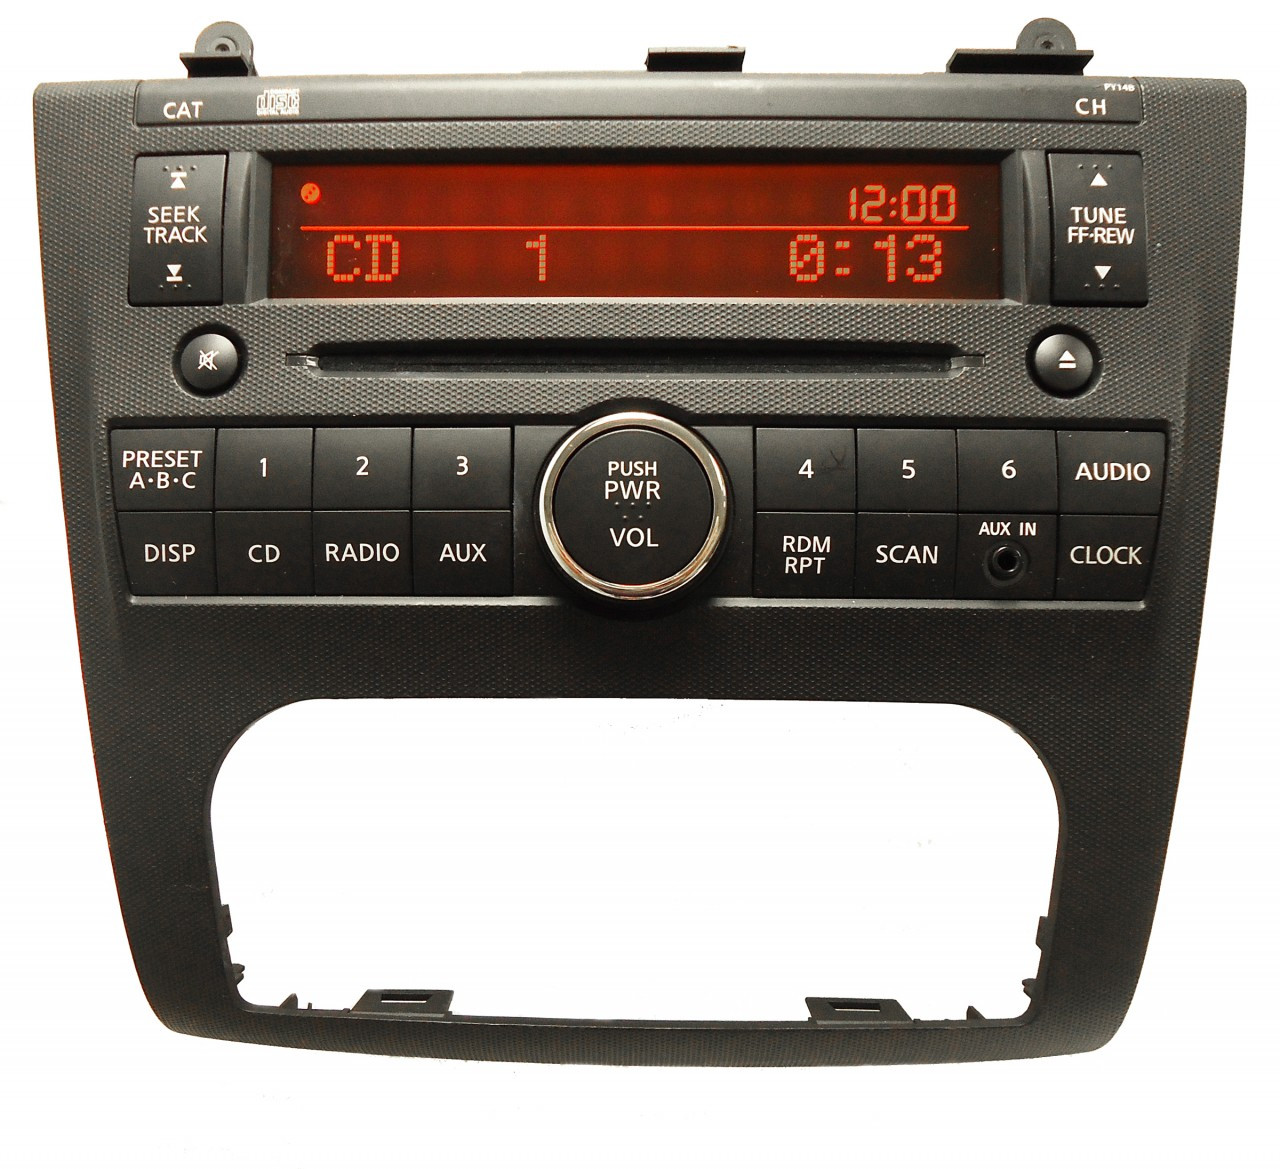 2007 nissan altima radio not working